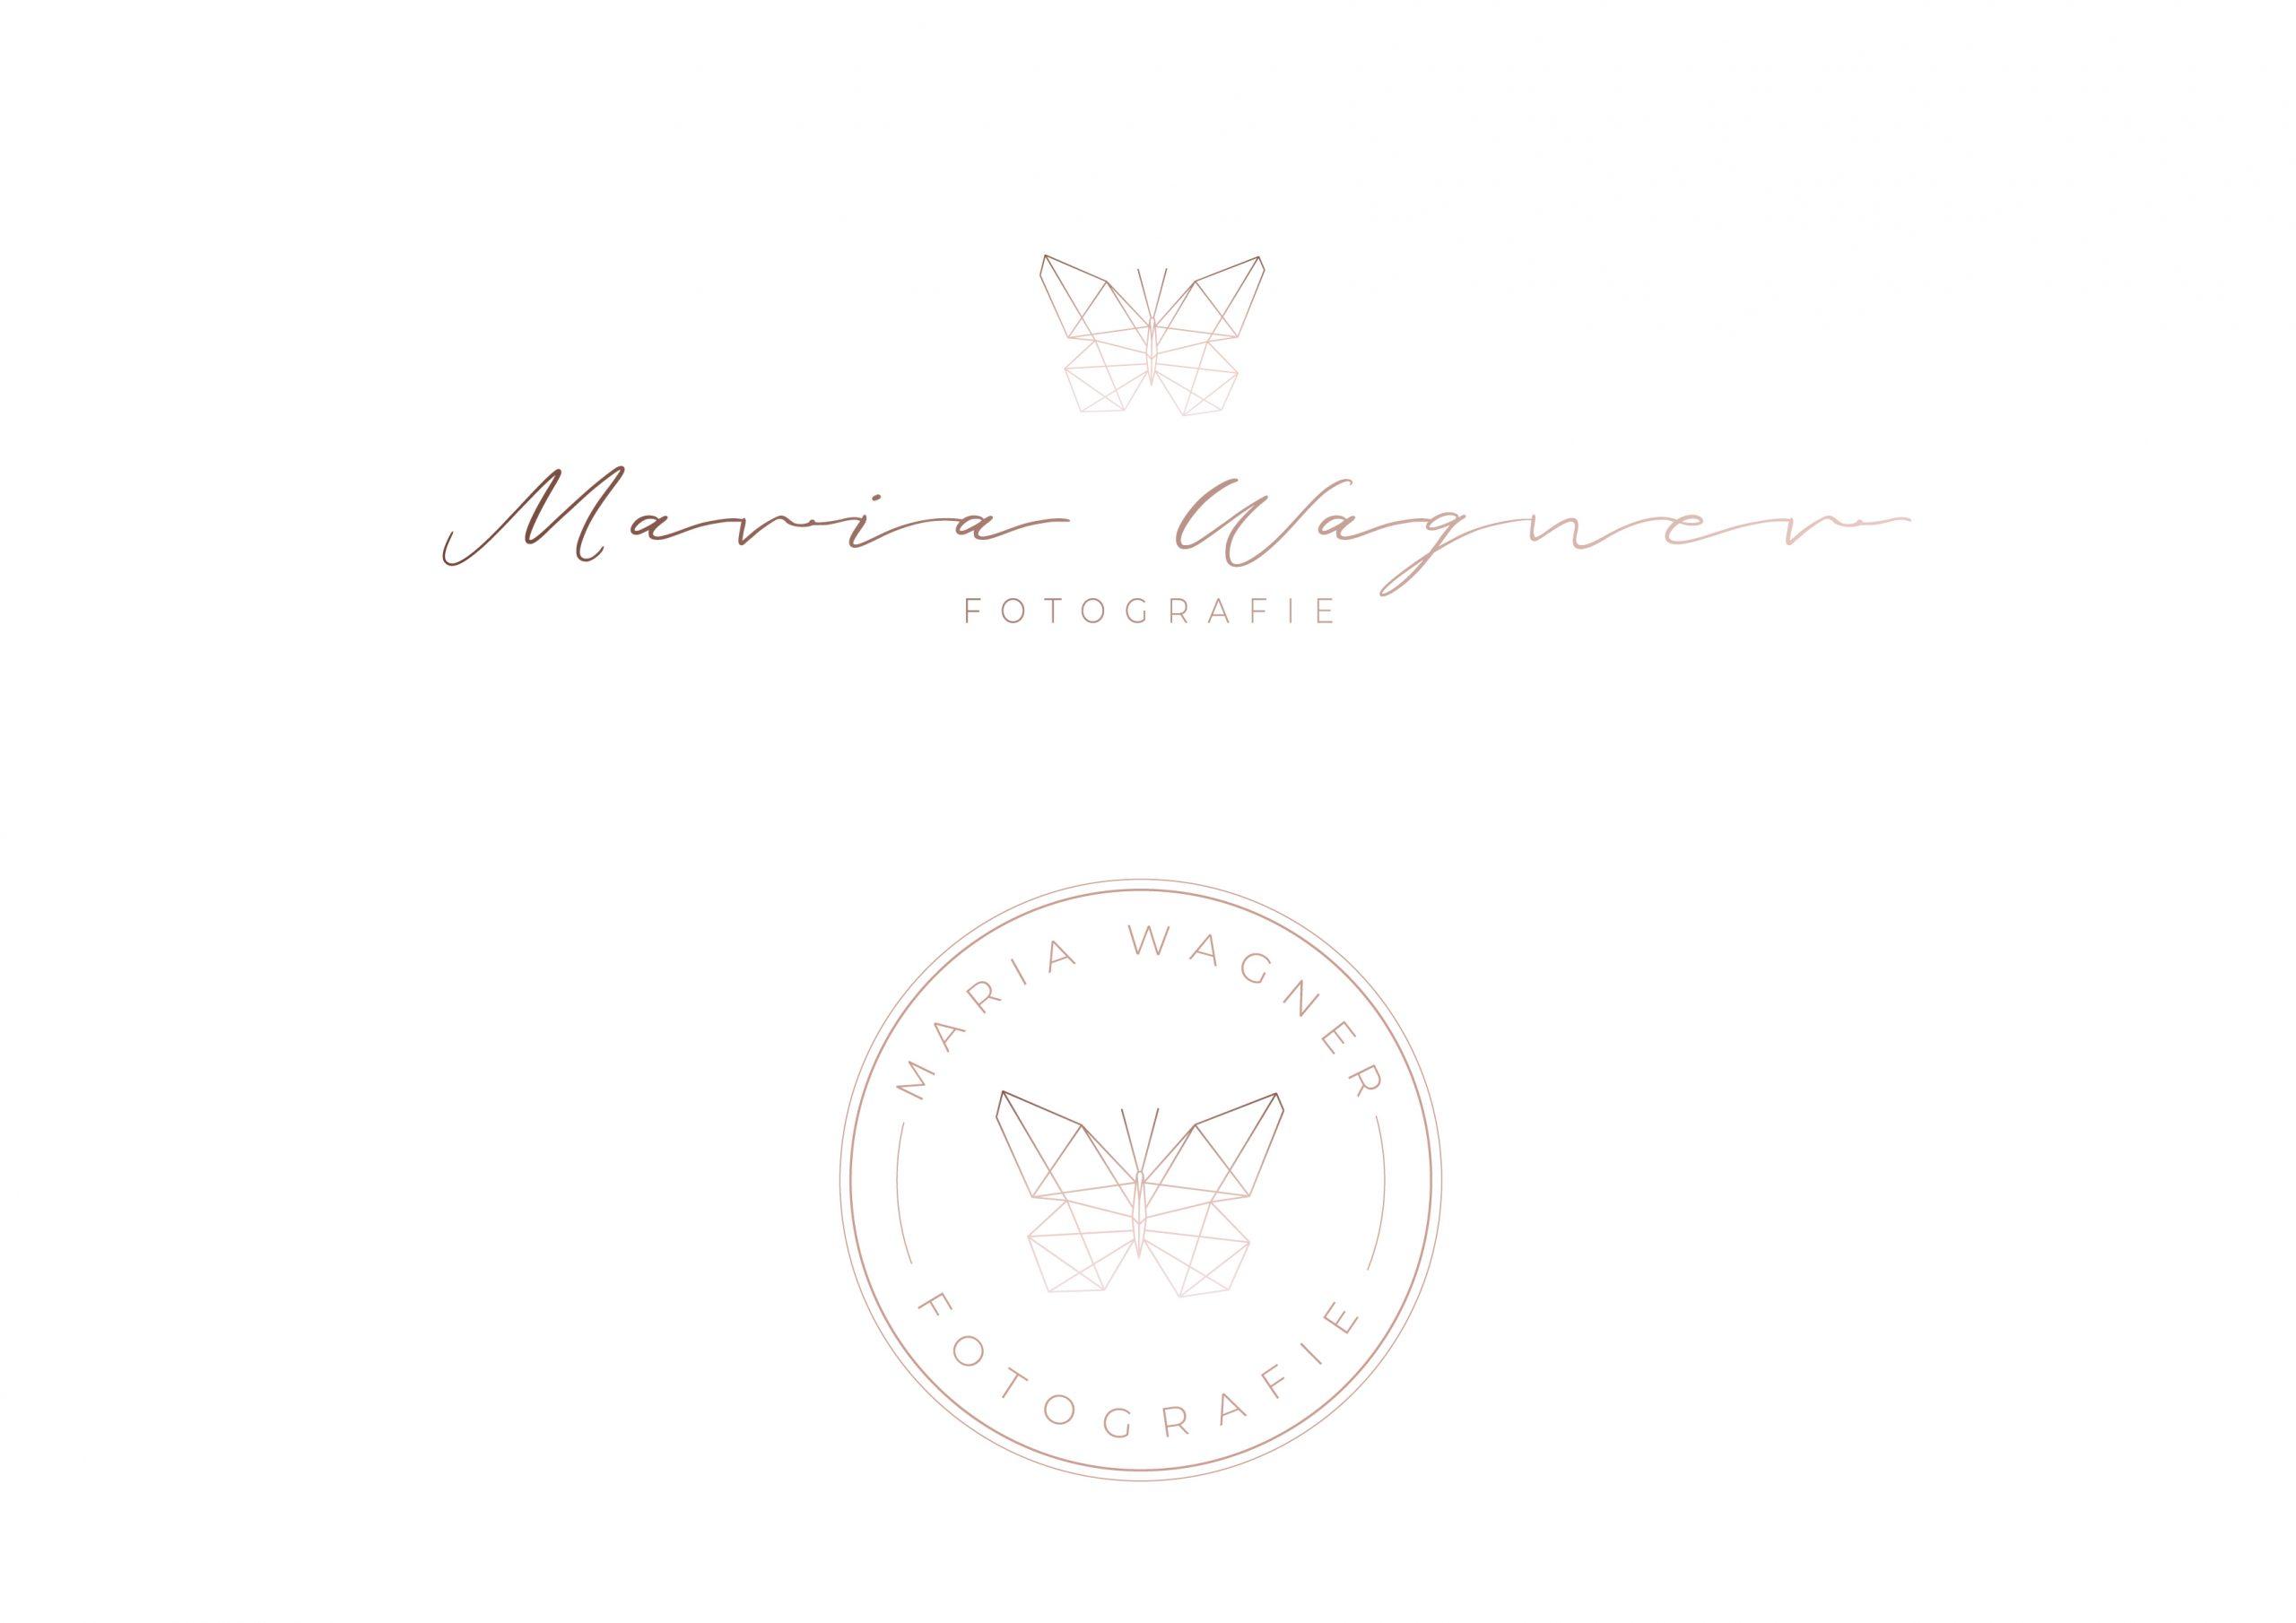 Logodesign Fotografie Hochzeitsfotografie Neugeborenenfotografie Familienfotografie roségold Schmetterling Logo